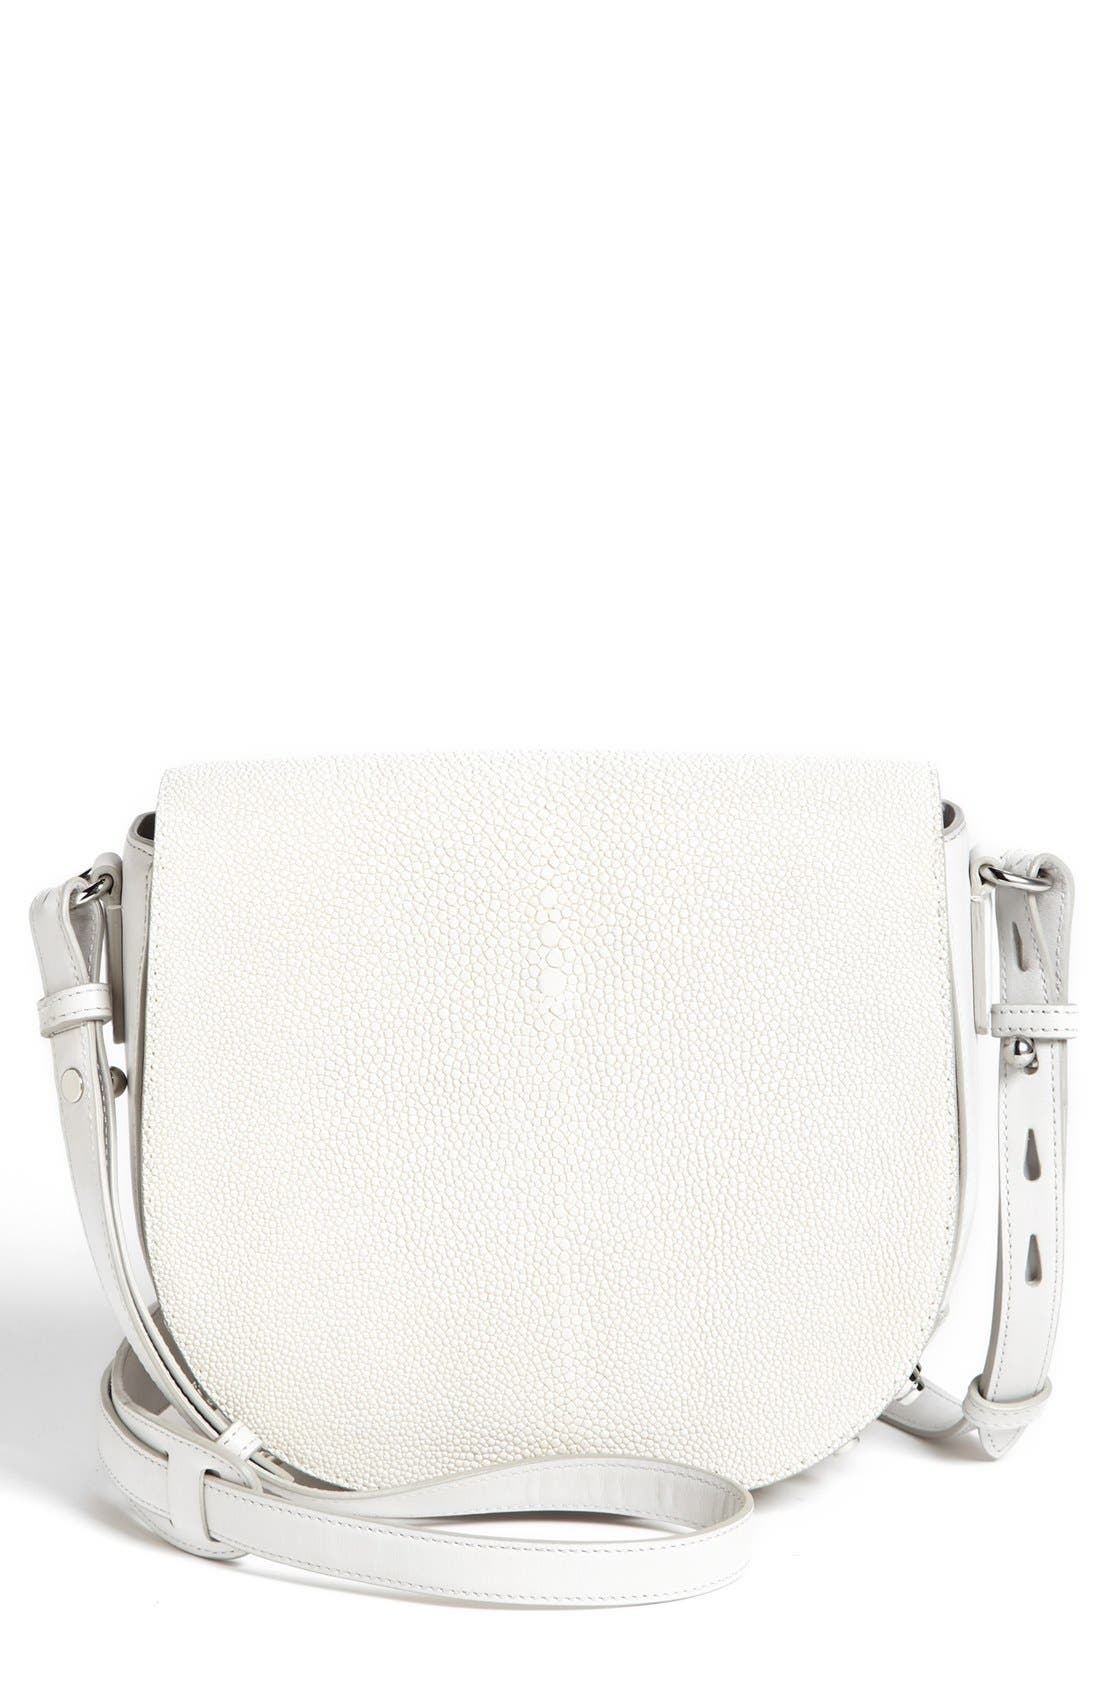 Main Image - Alexander Wang 'Lia Stingray - Small' Leather Crossbody Bag